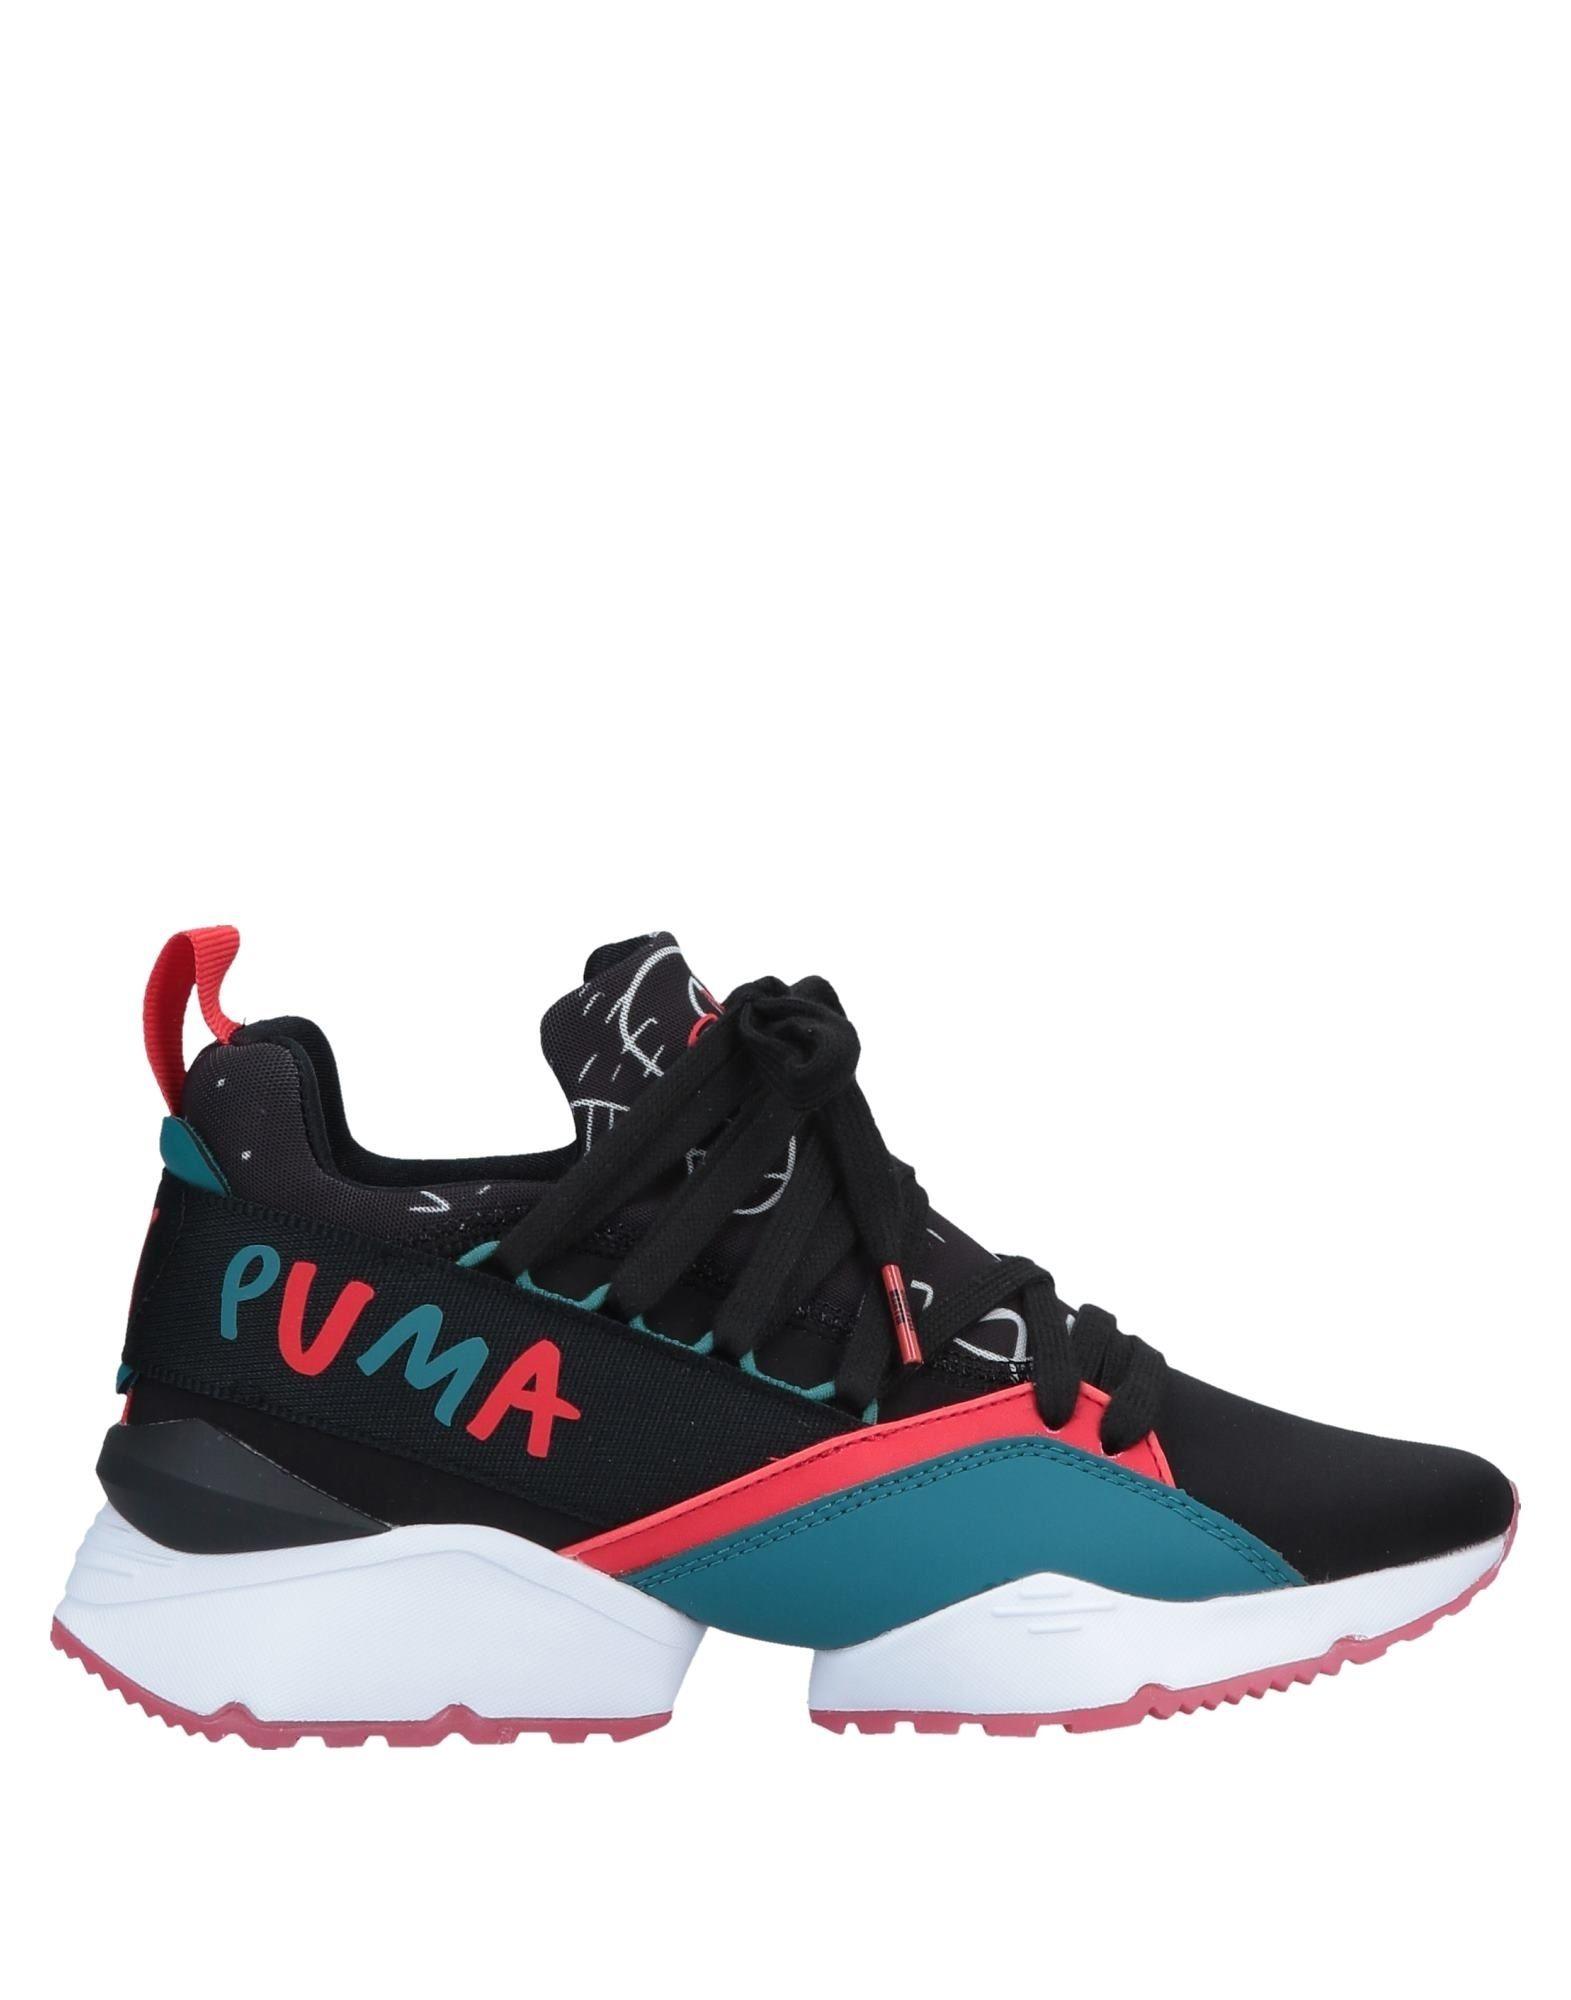 Puma X Shantell Martin Sneakers - Women